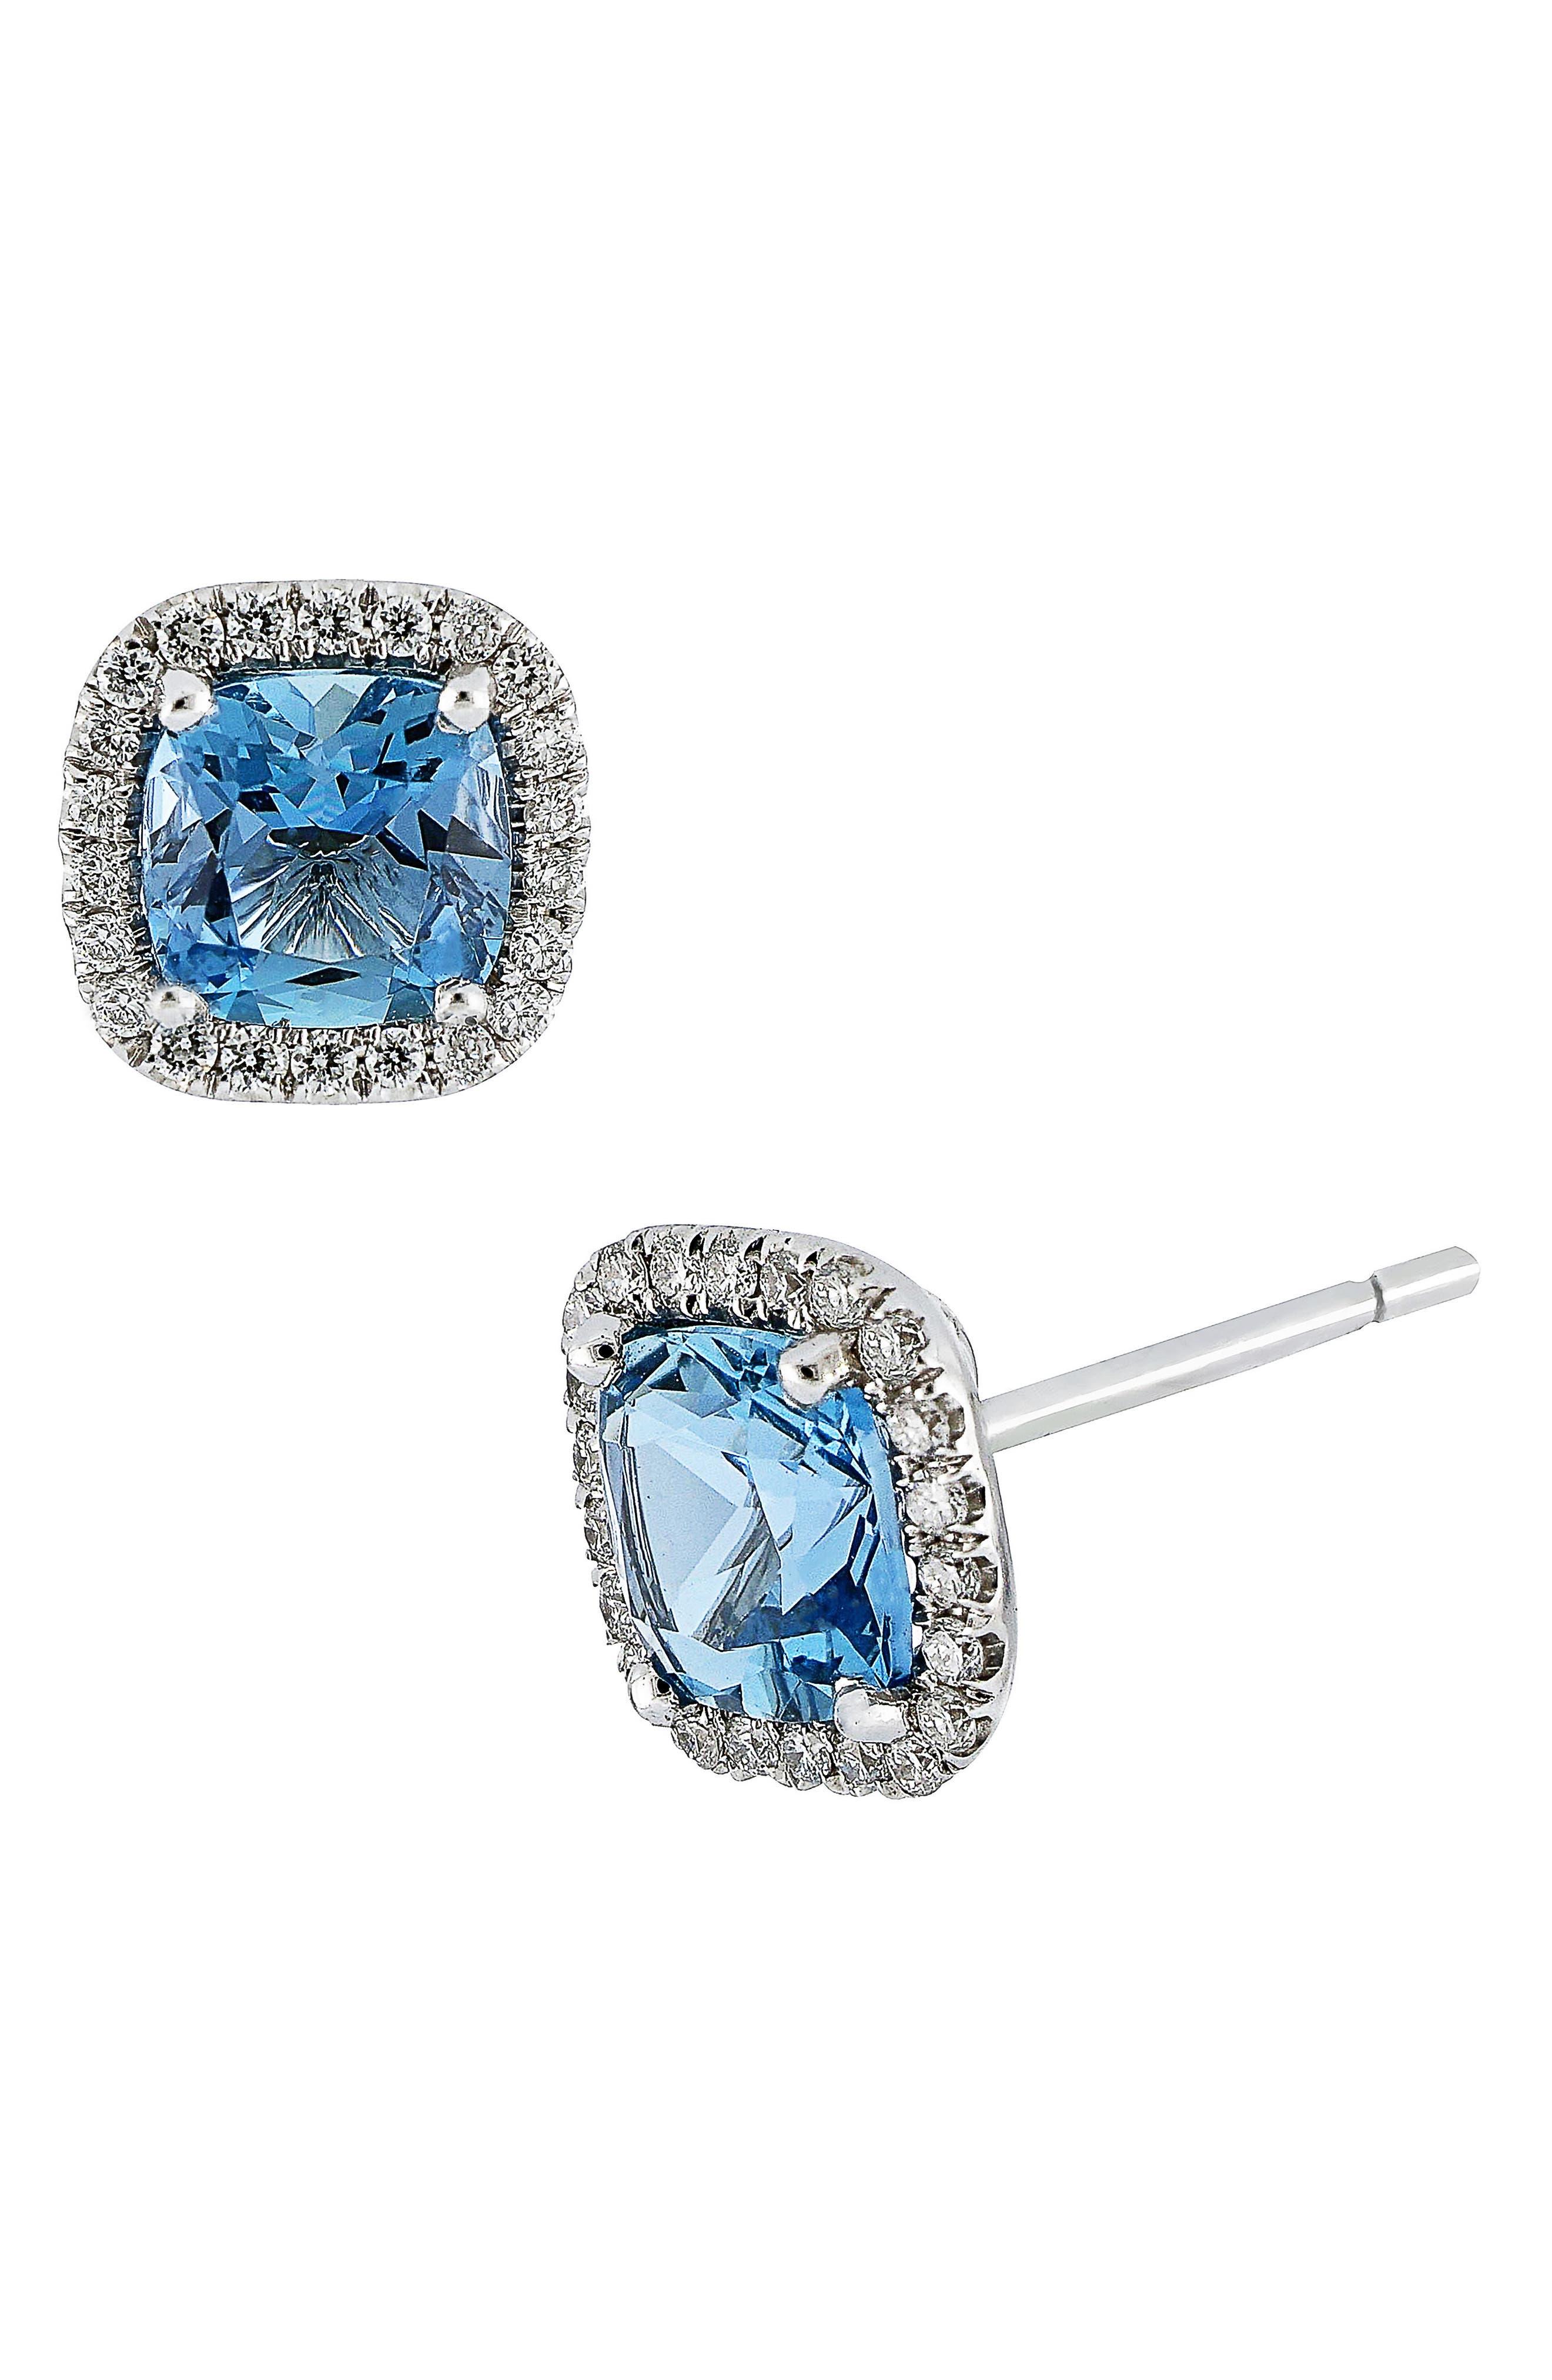 Aquamarine & Diamond Earrings,                         Main,                         color, White Gold